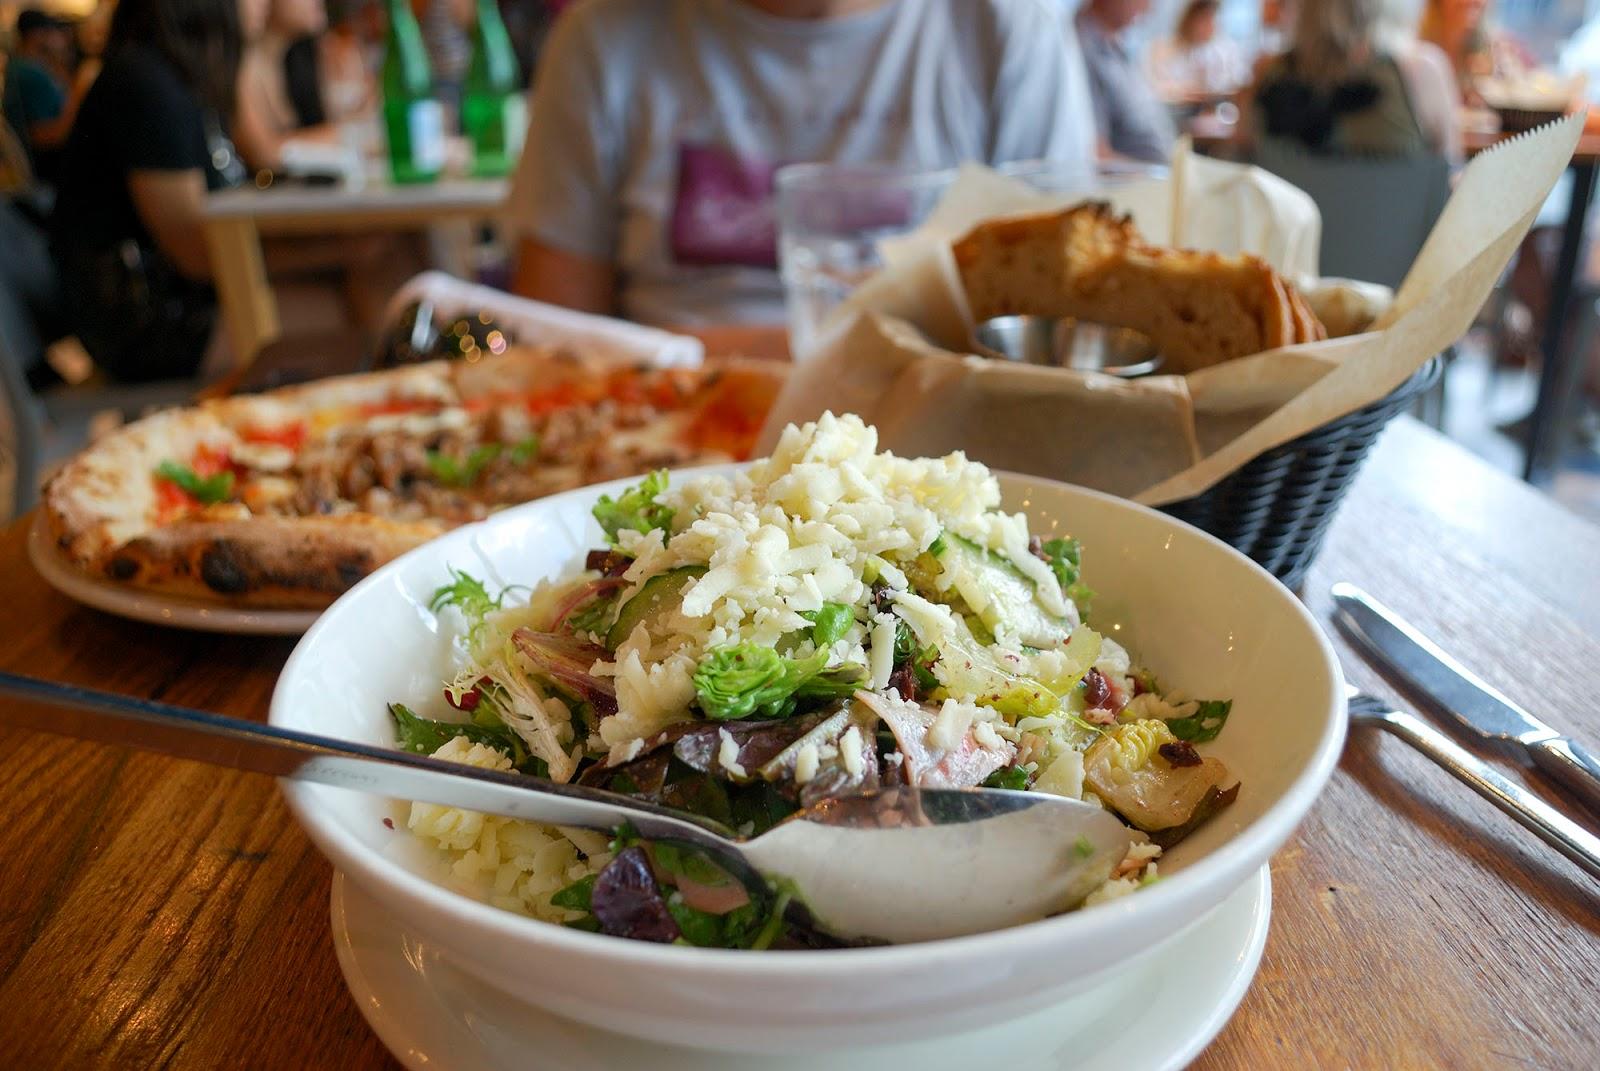 new york itinerary guide plan eataly westfield wtc food market restaurant manhattan italian